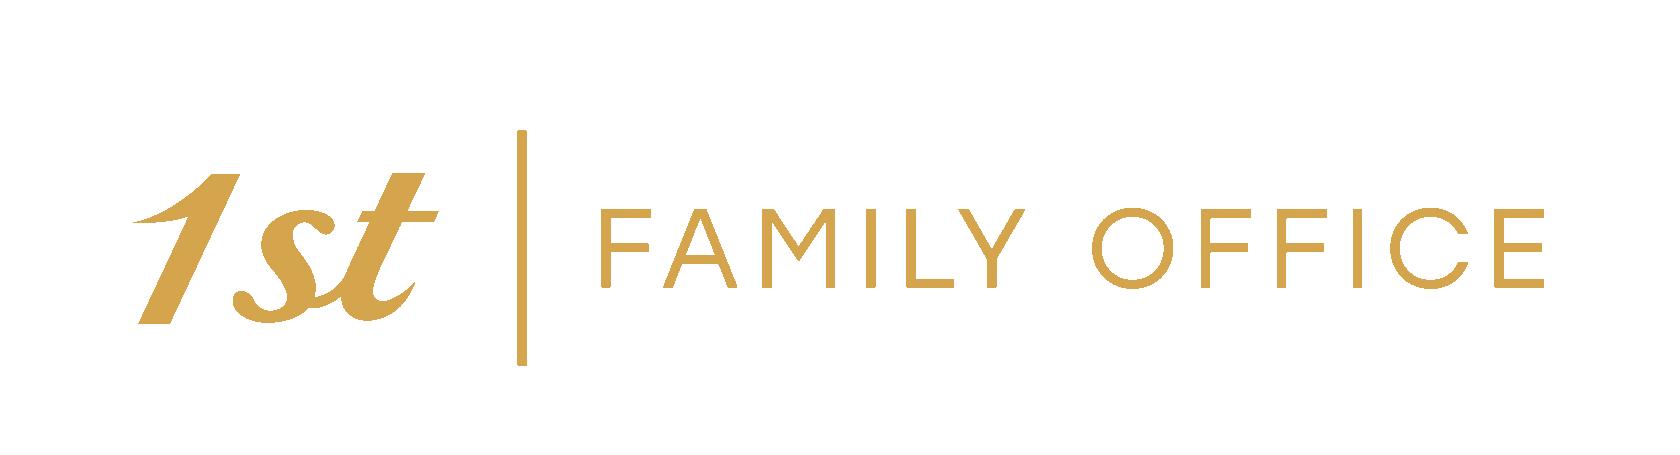 Tanzania by 1st Family Office